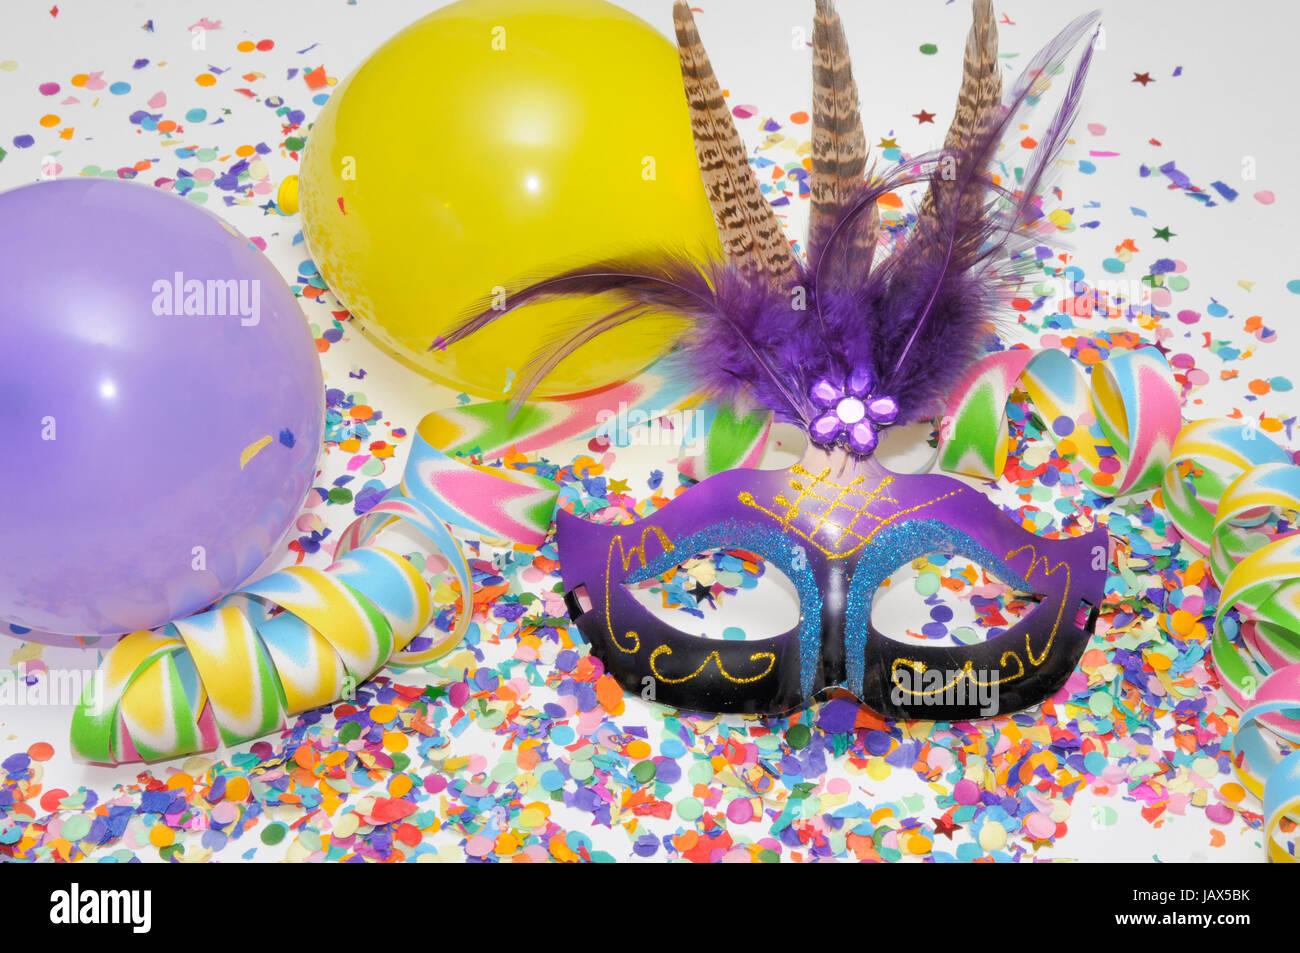 Konfetti Luftschlangen Karneval Fasching Fastnacht Maske Stock